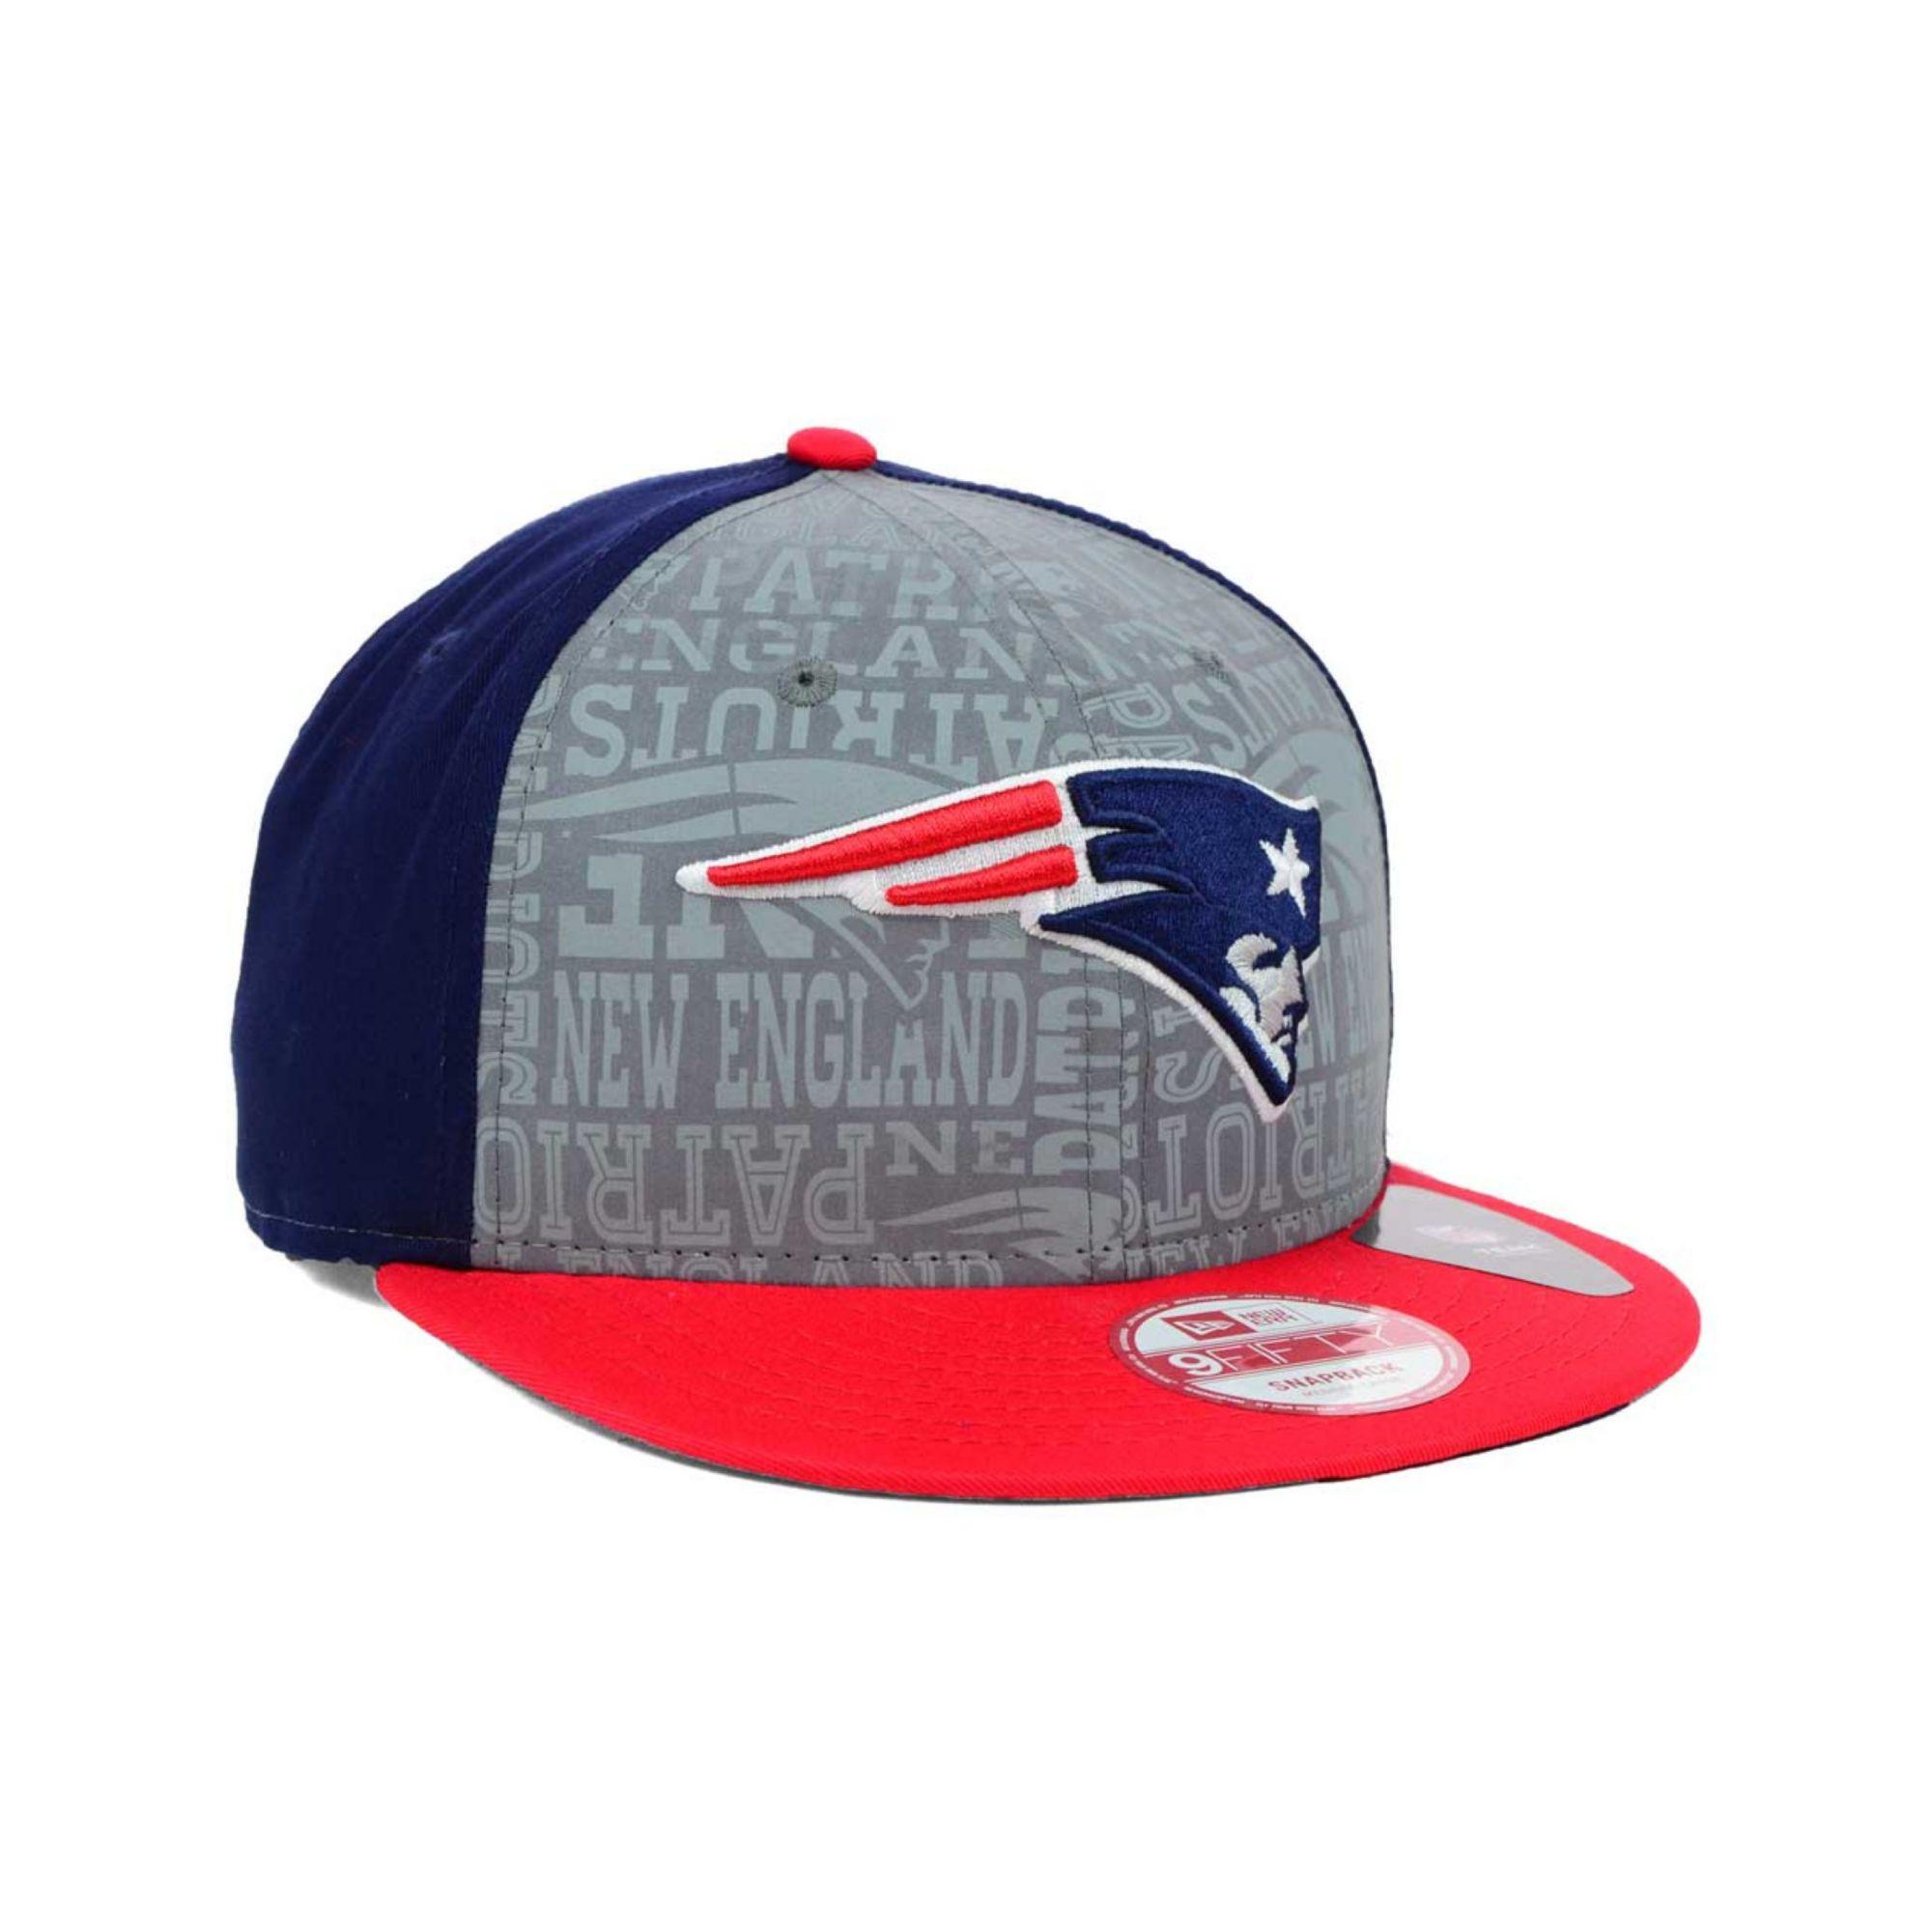 ea888ce4fa5eb KTZ Gray New England Patriots Nfl Draft 9fifty Snapback Cap for men